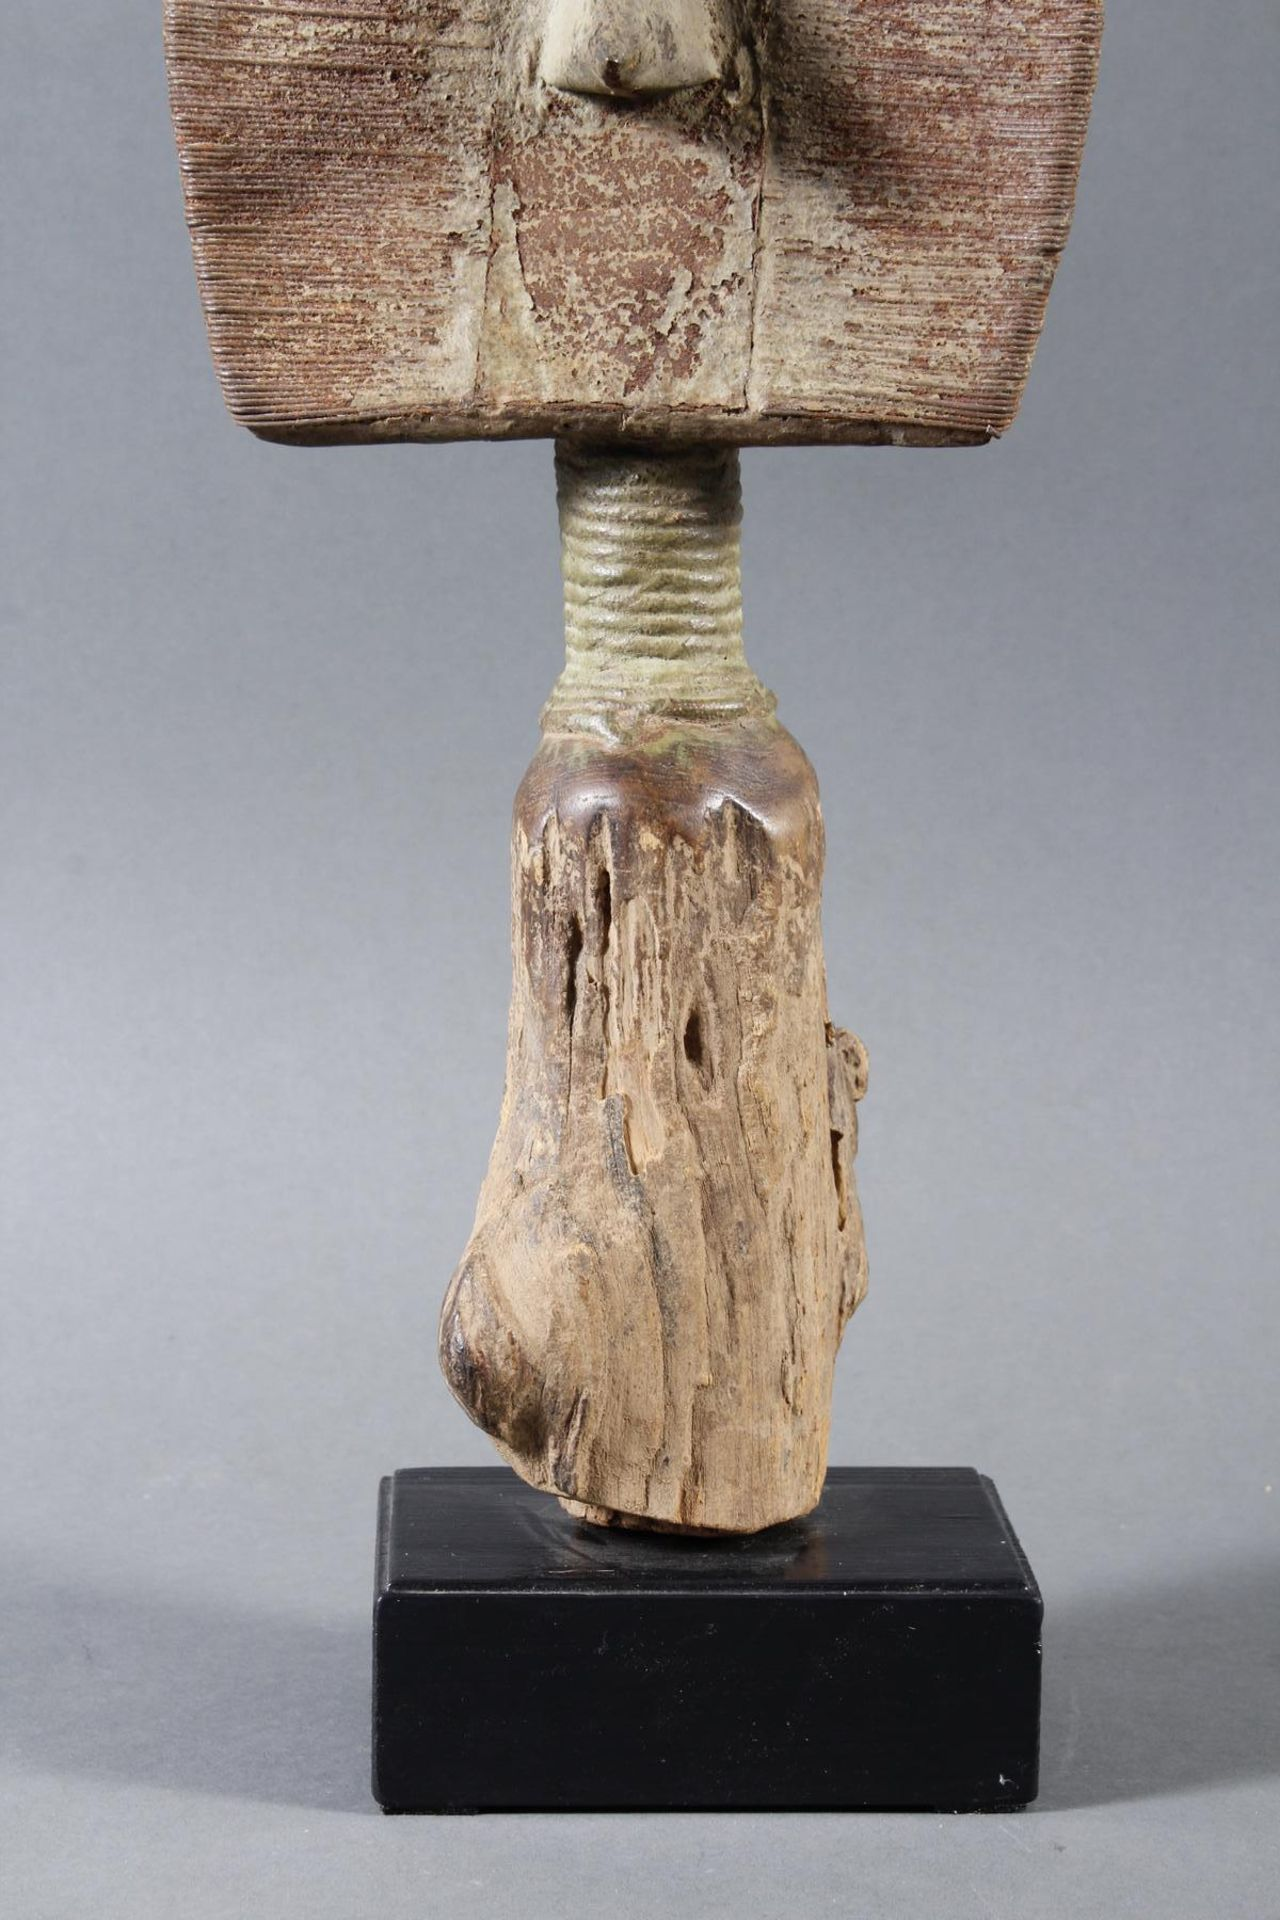 Grabwächter, Reliquiarfigur, Mahongwe / Gabun - Bild 3 aus 7